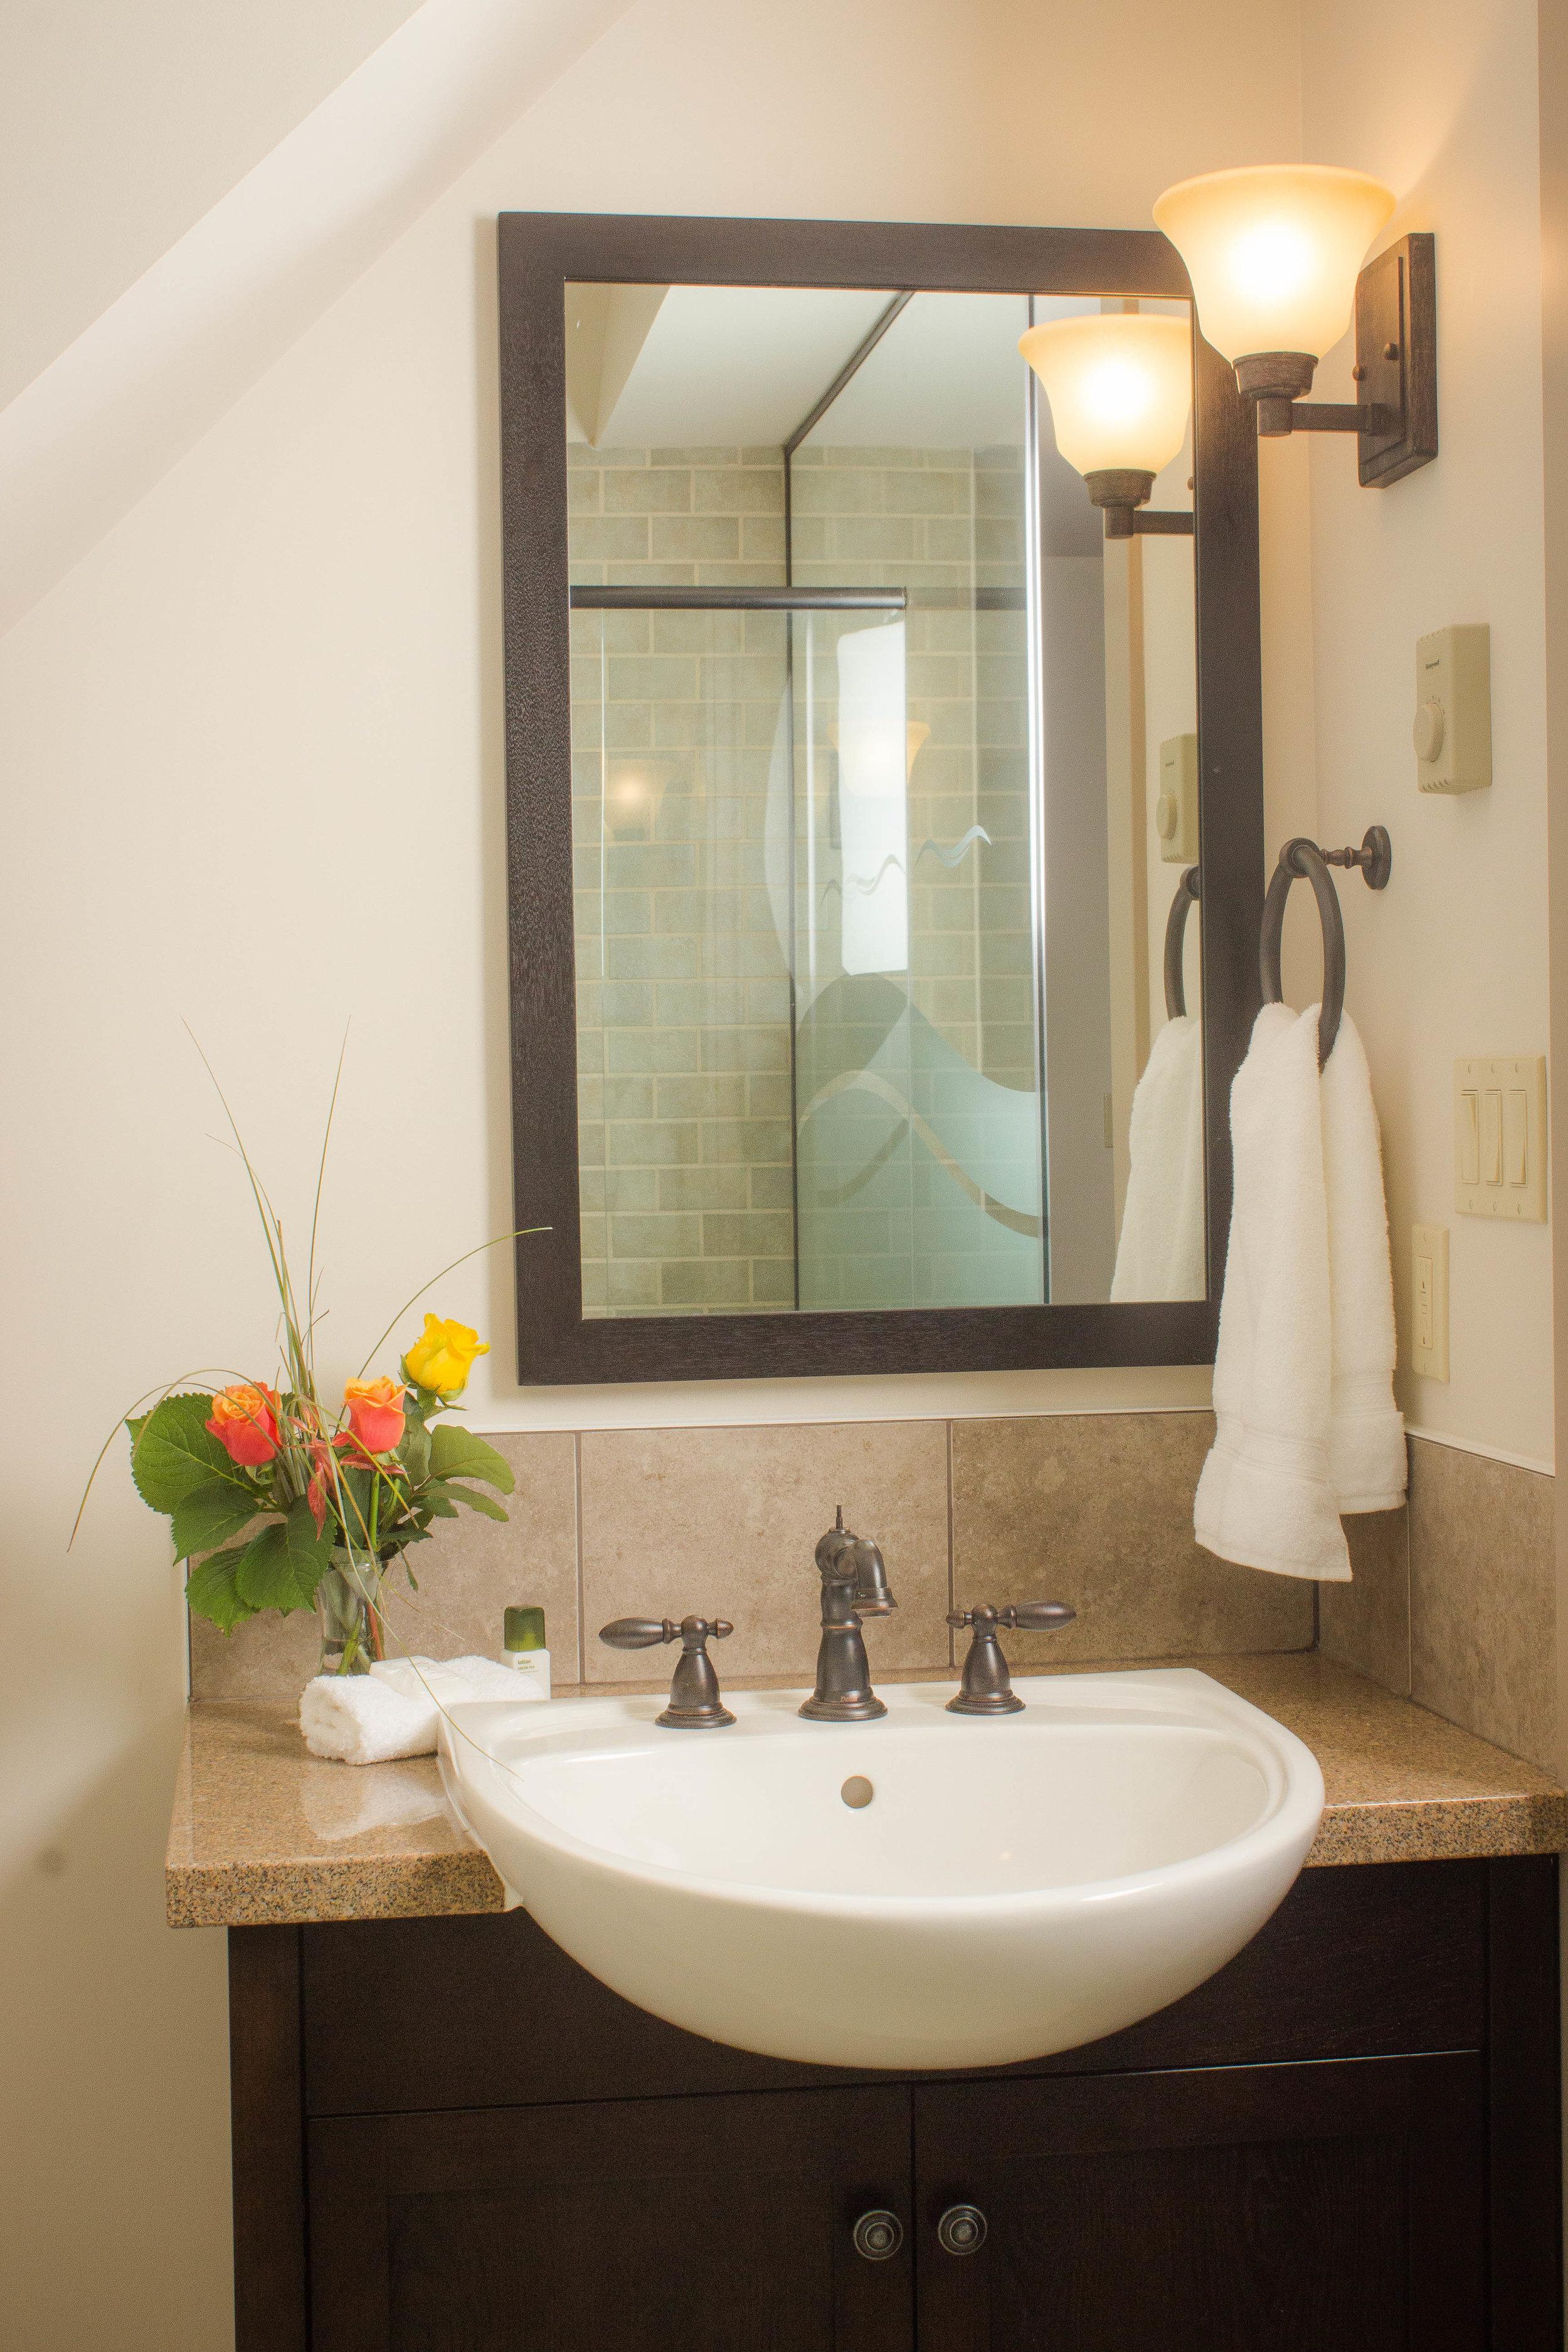 Quartz or granite countertops in all bathrooms and powder rooms